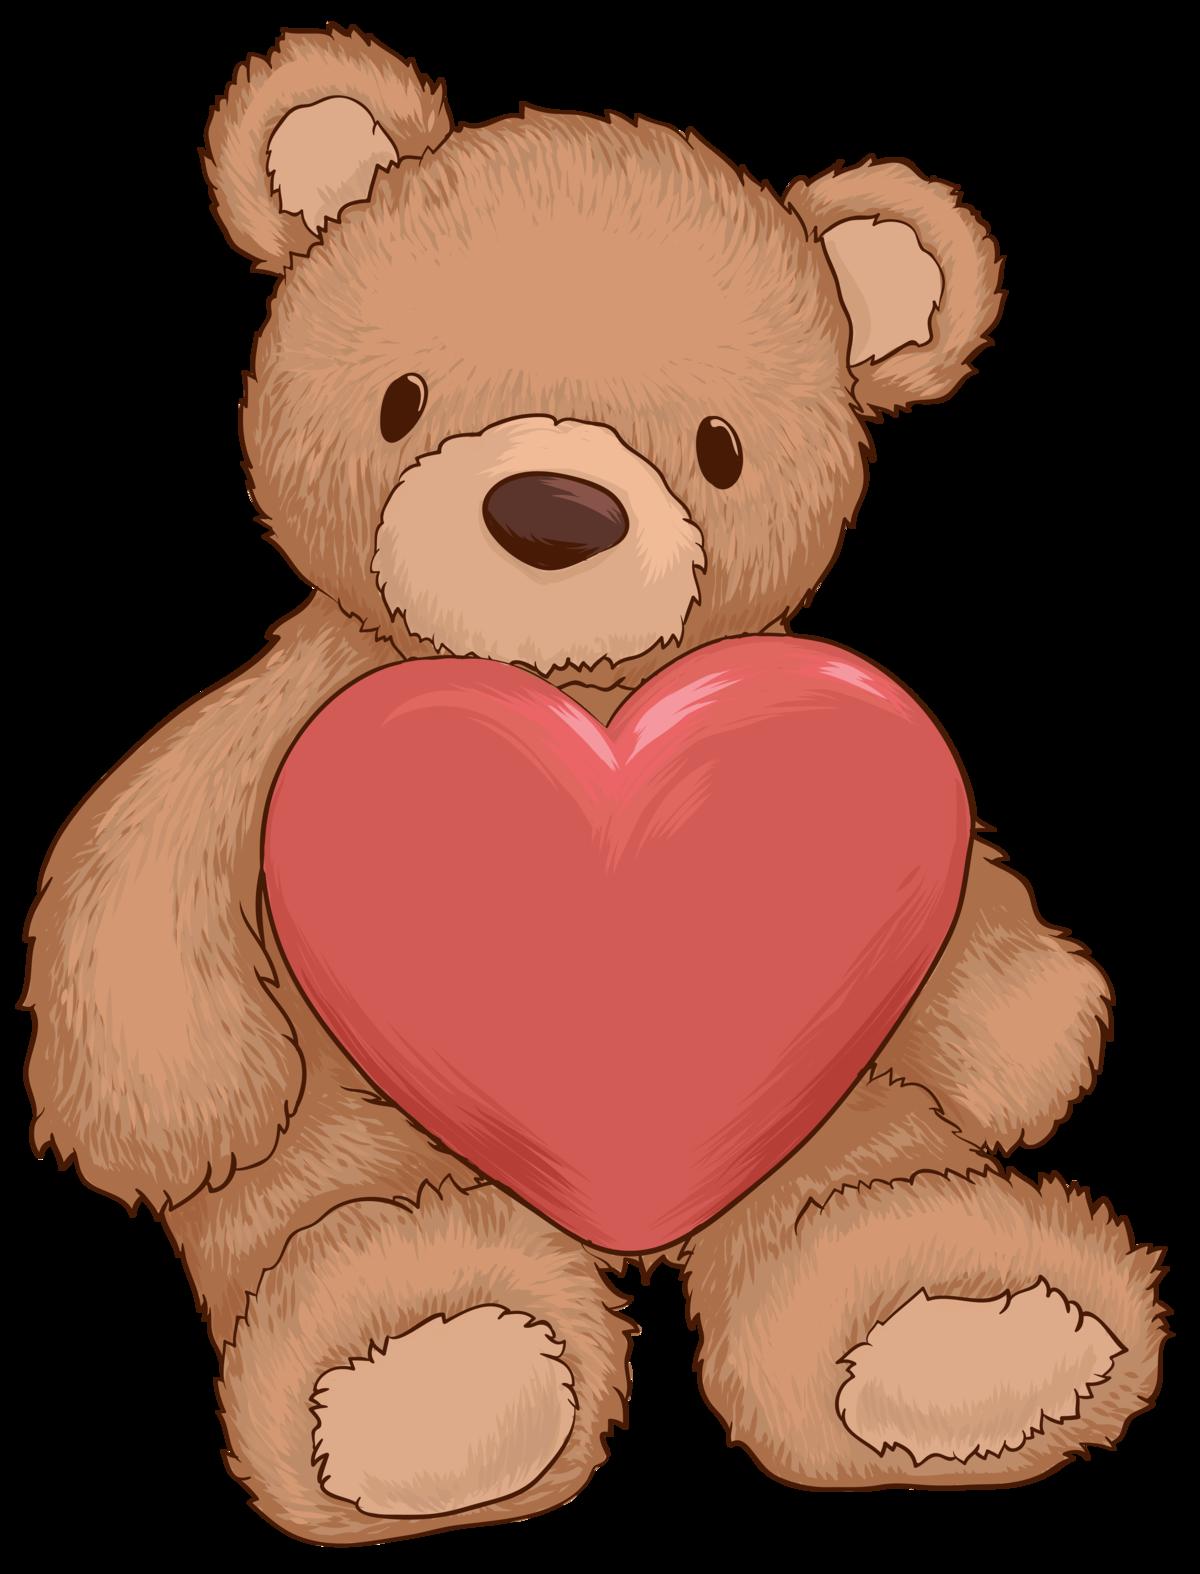 Картинки мишки с сердцем